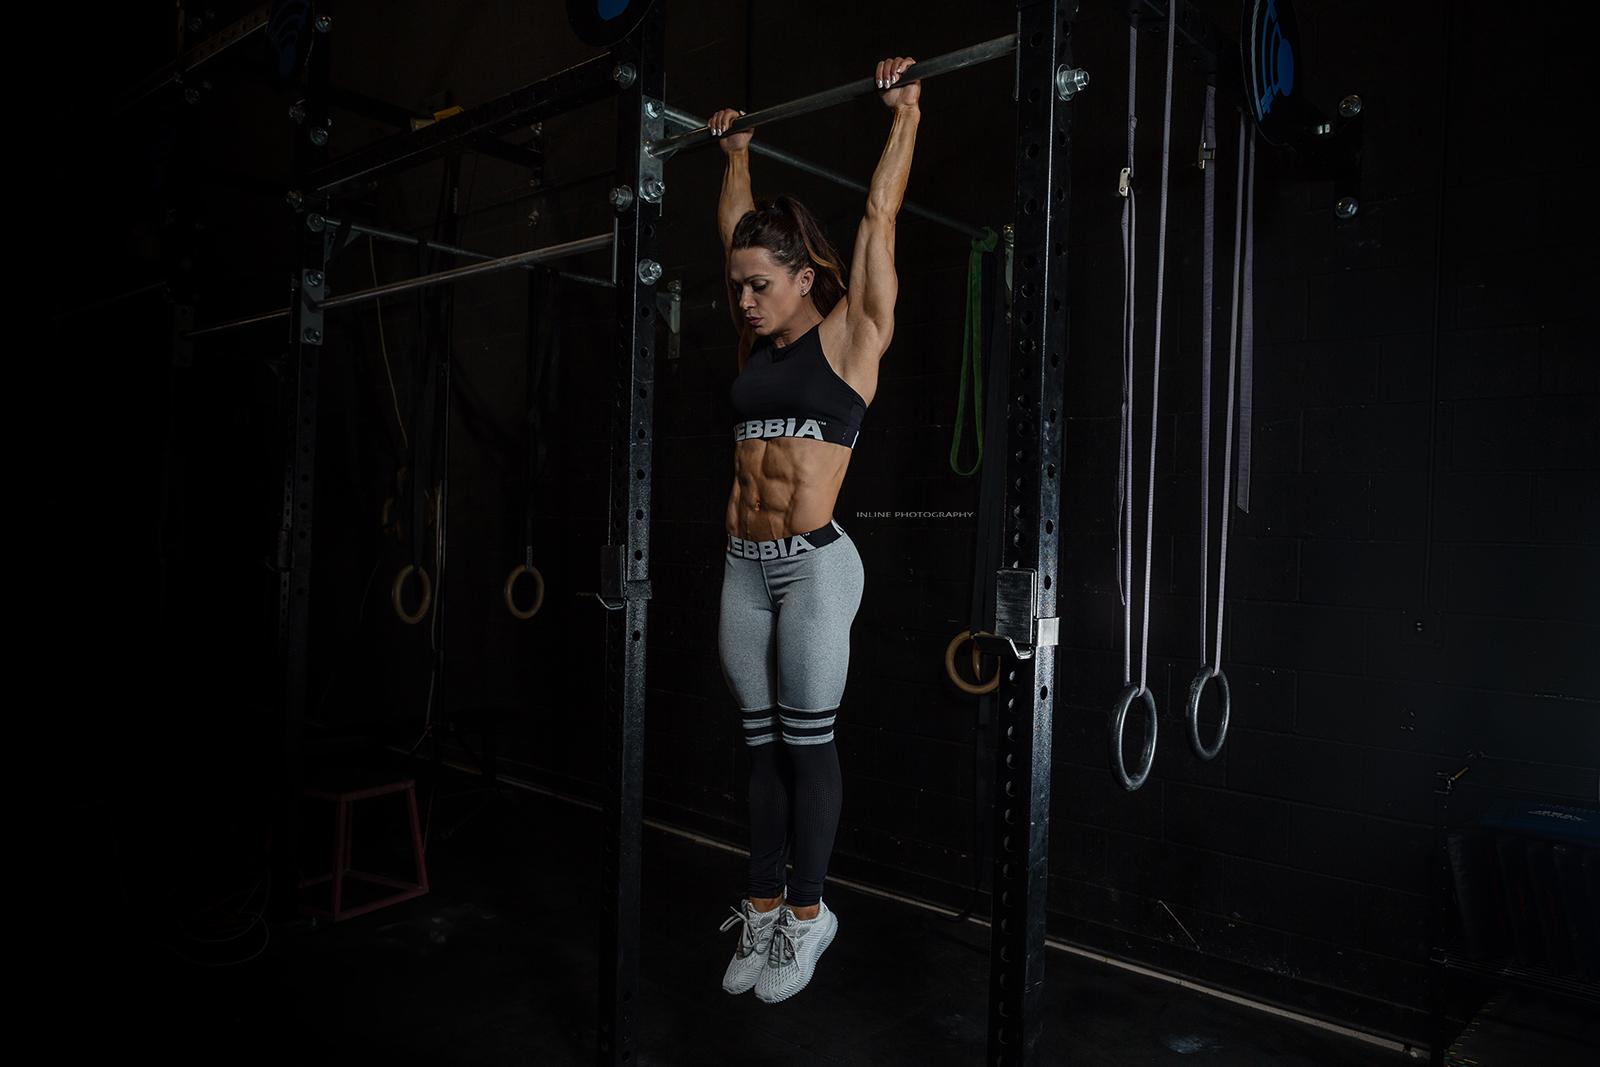 170915-Nebbia-Fitness-1429.jpg